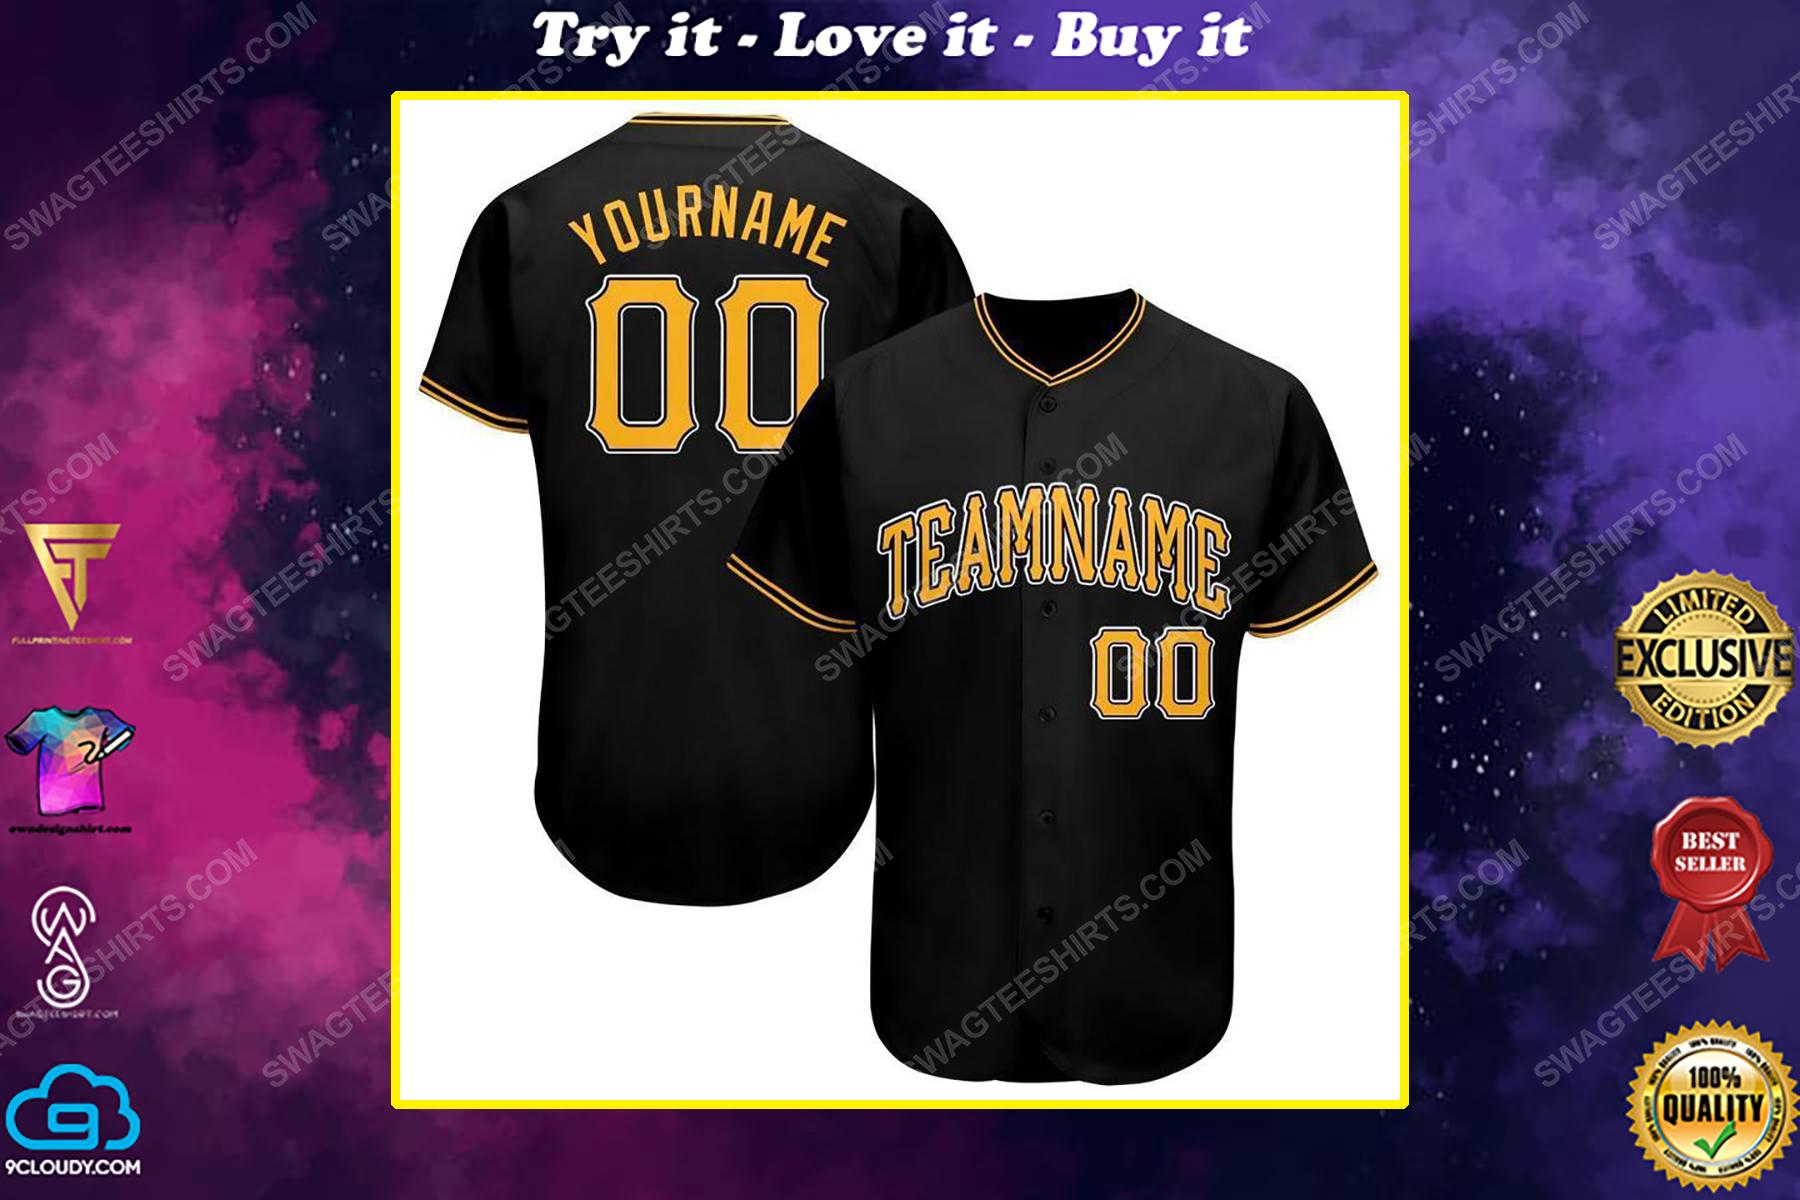 Custom team name pittsburgh pirates full printed baseball jersey